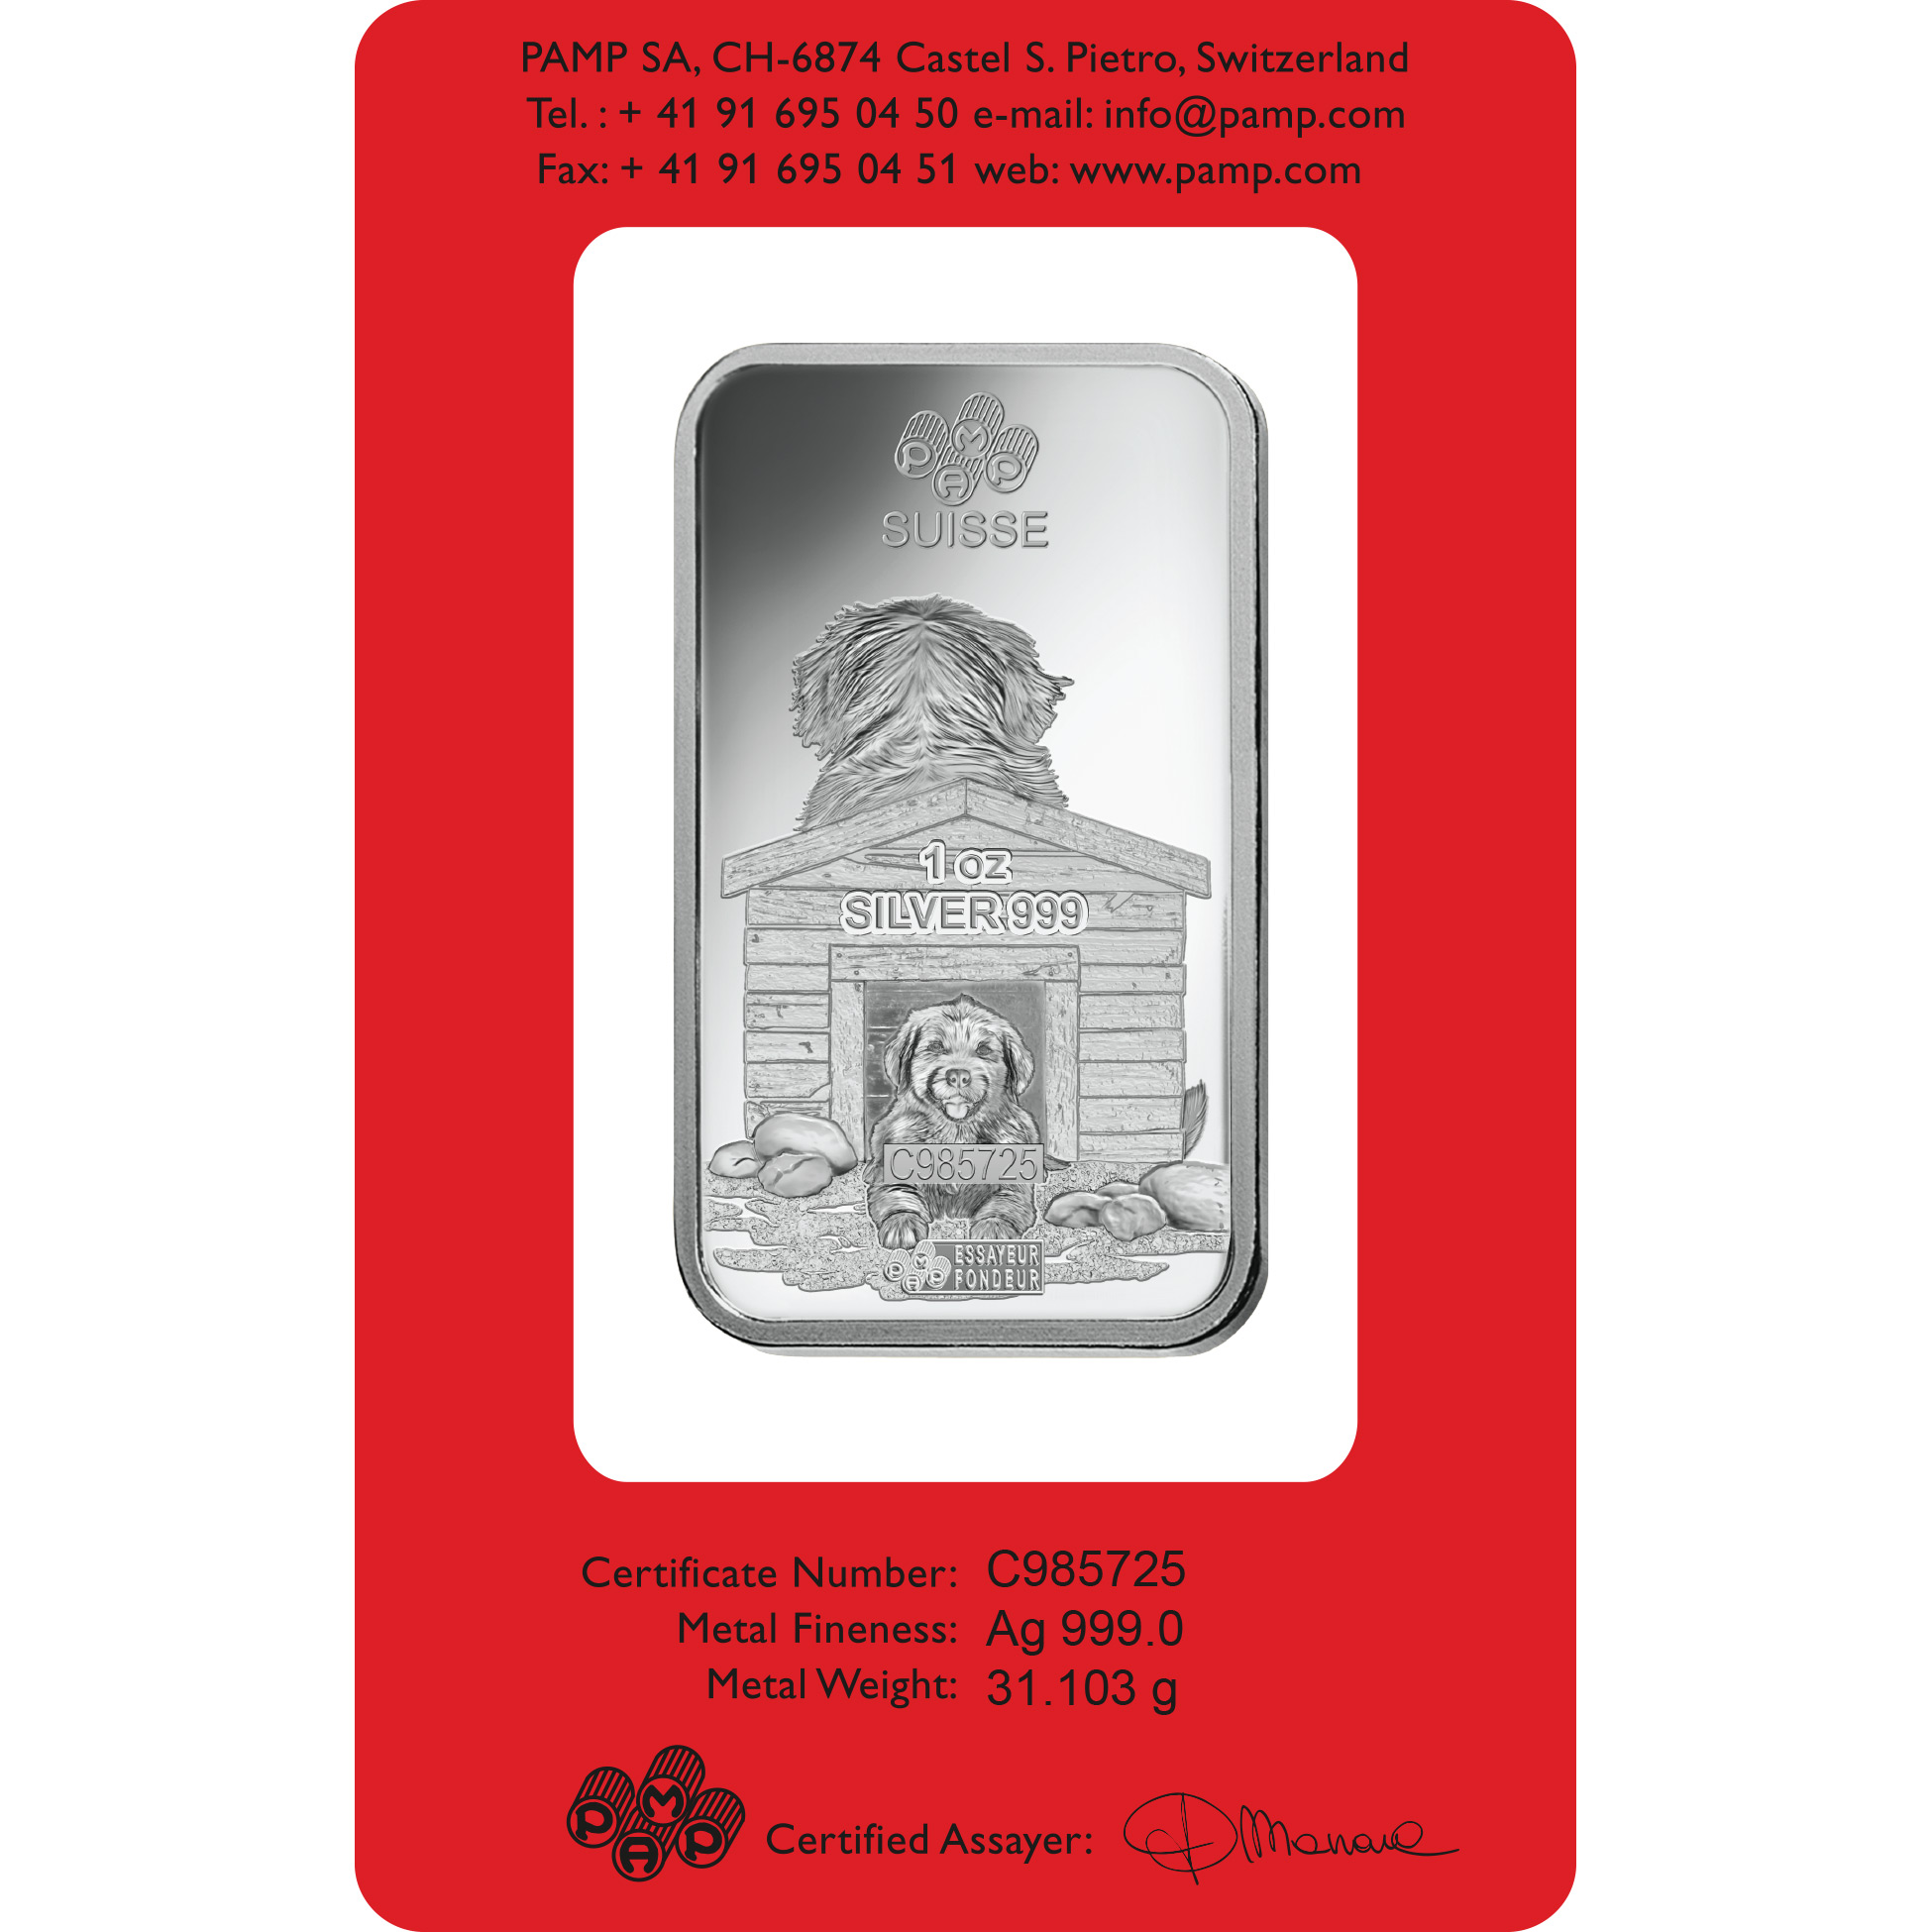 1 oncia lingottino d'argento puro 999.0 - PAMP Suisse Cane Lunare